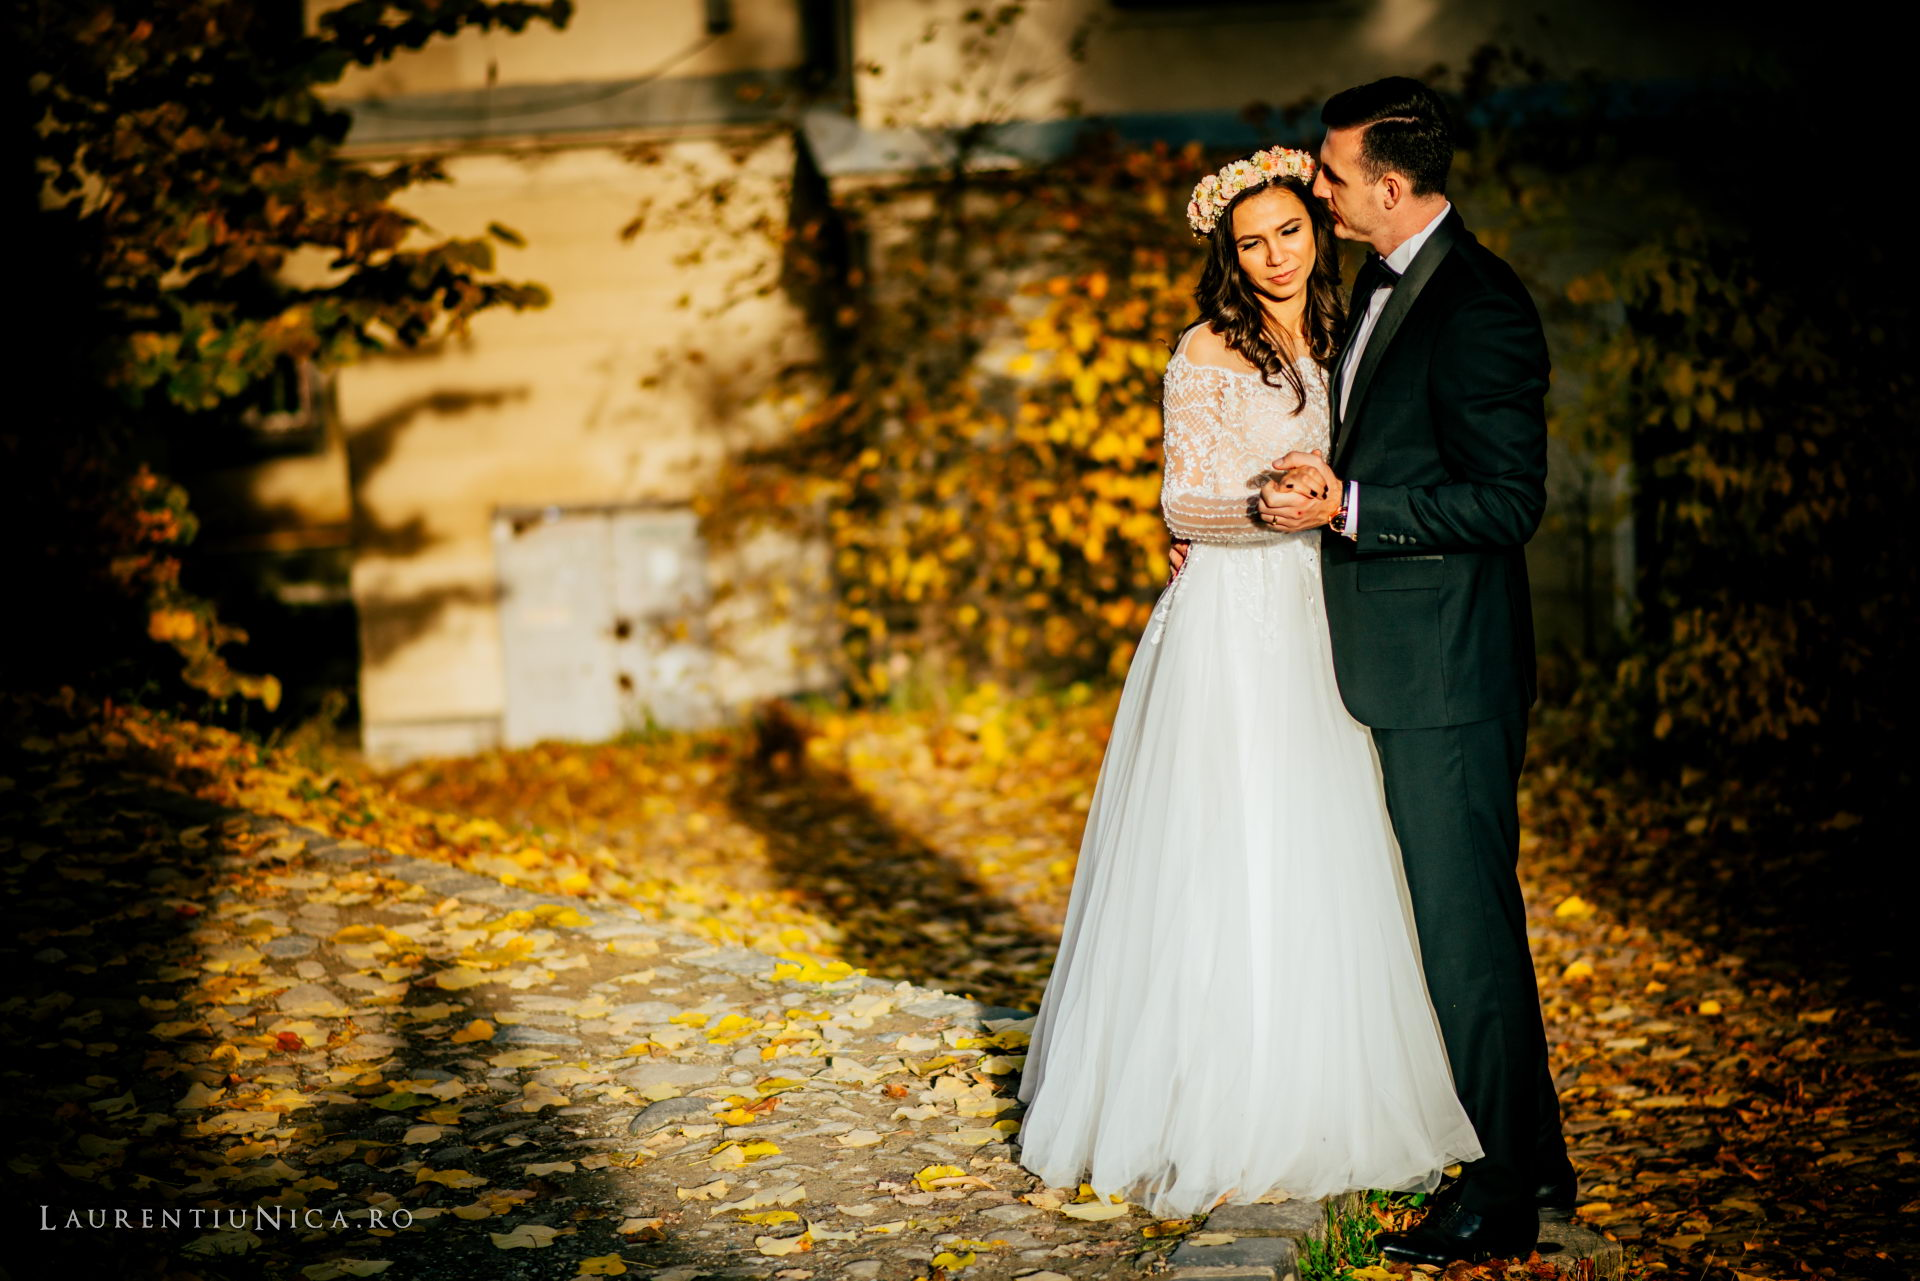 lili-si-dan-fotografii-nunta-after-wedding-sighisoara-laurentiu-nica28